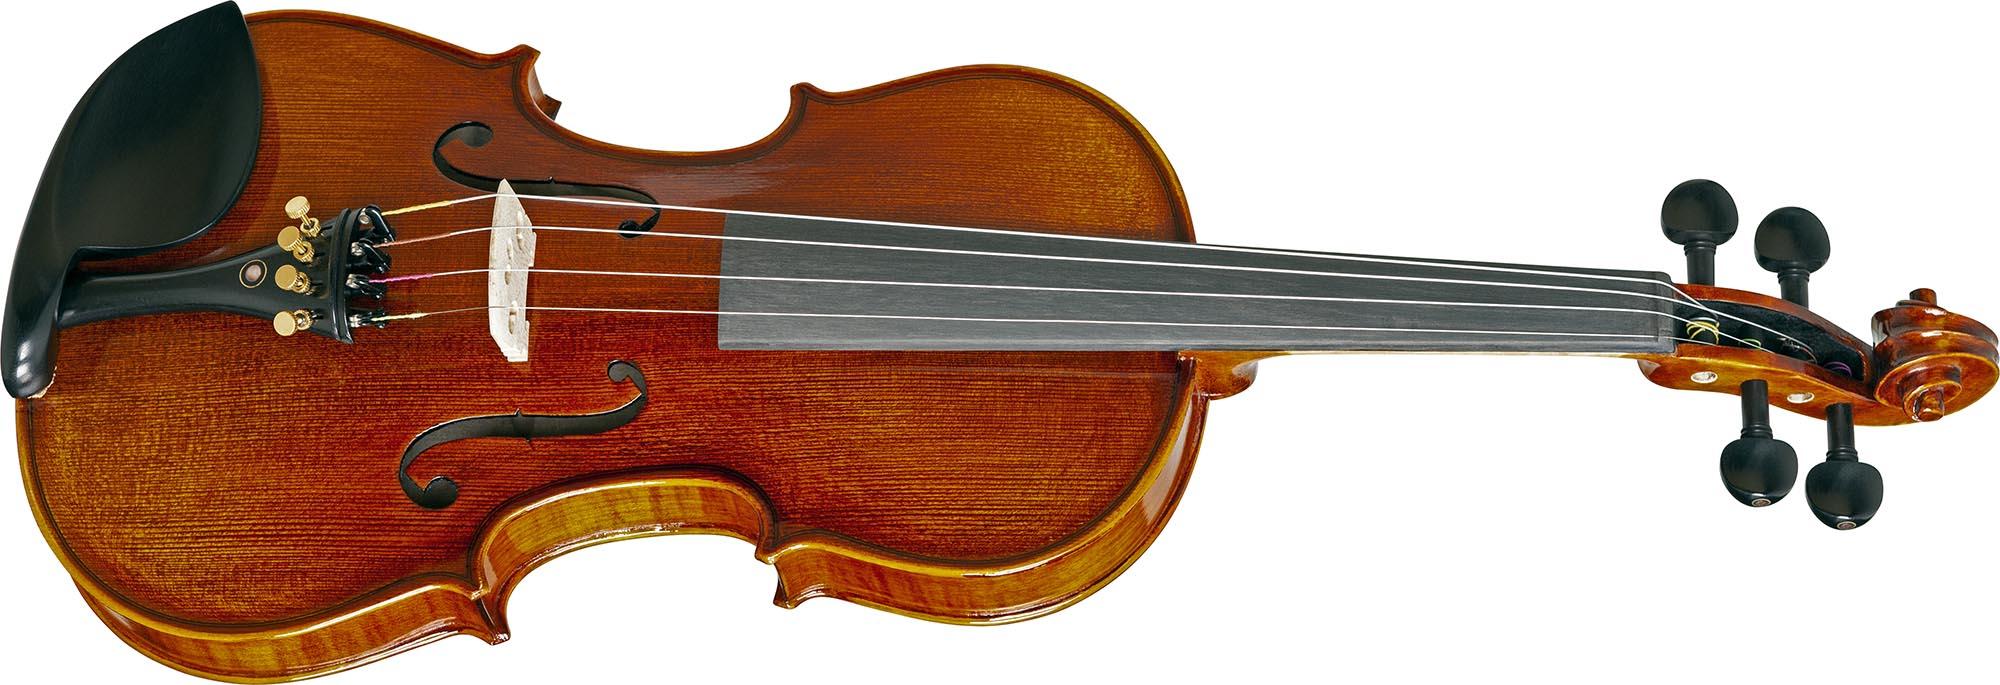 vk644 violino eagle vk644 visao frontal